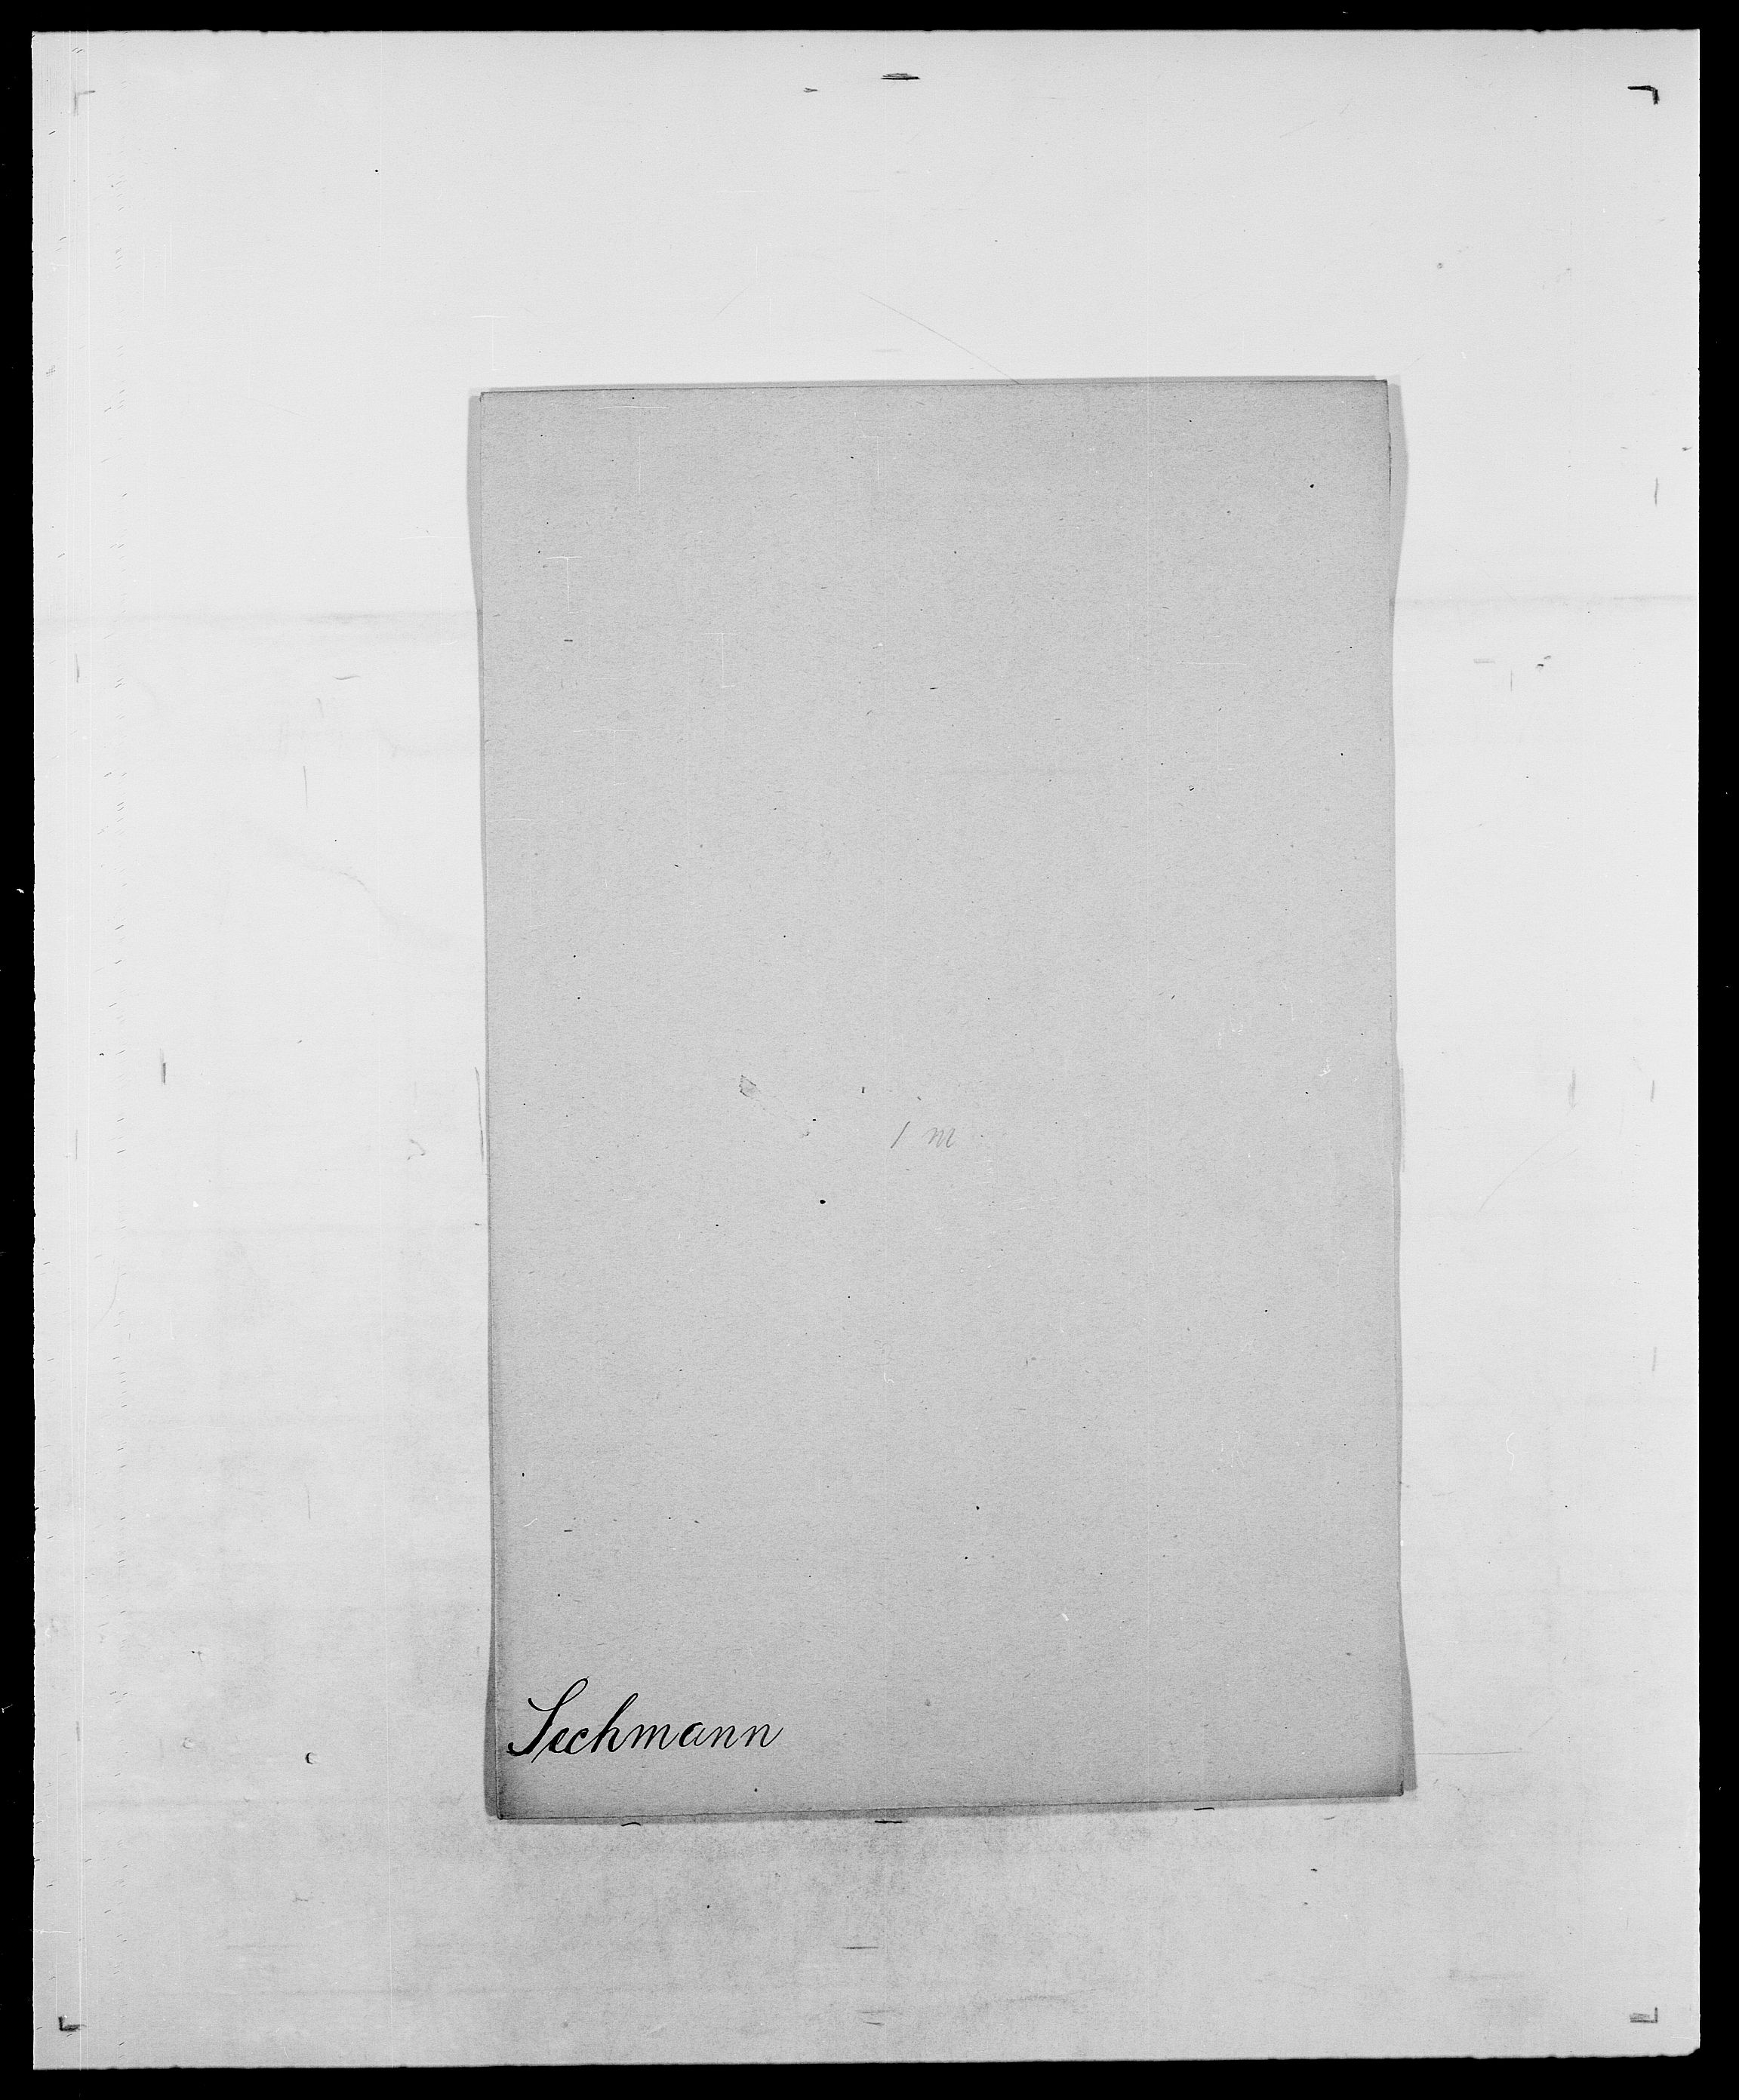 SAO, Delgobe, Charles Antoine - samling, D/Da/L0035: Schnabel - sjetman, s. 525